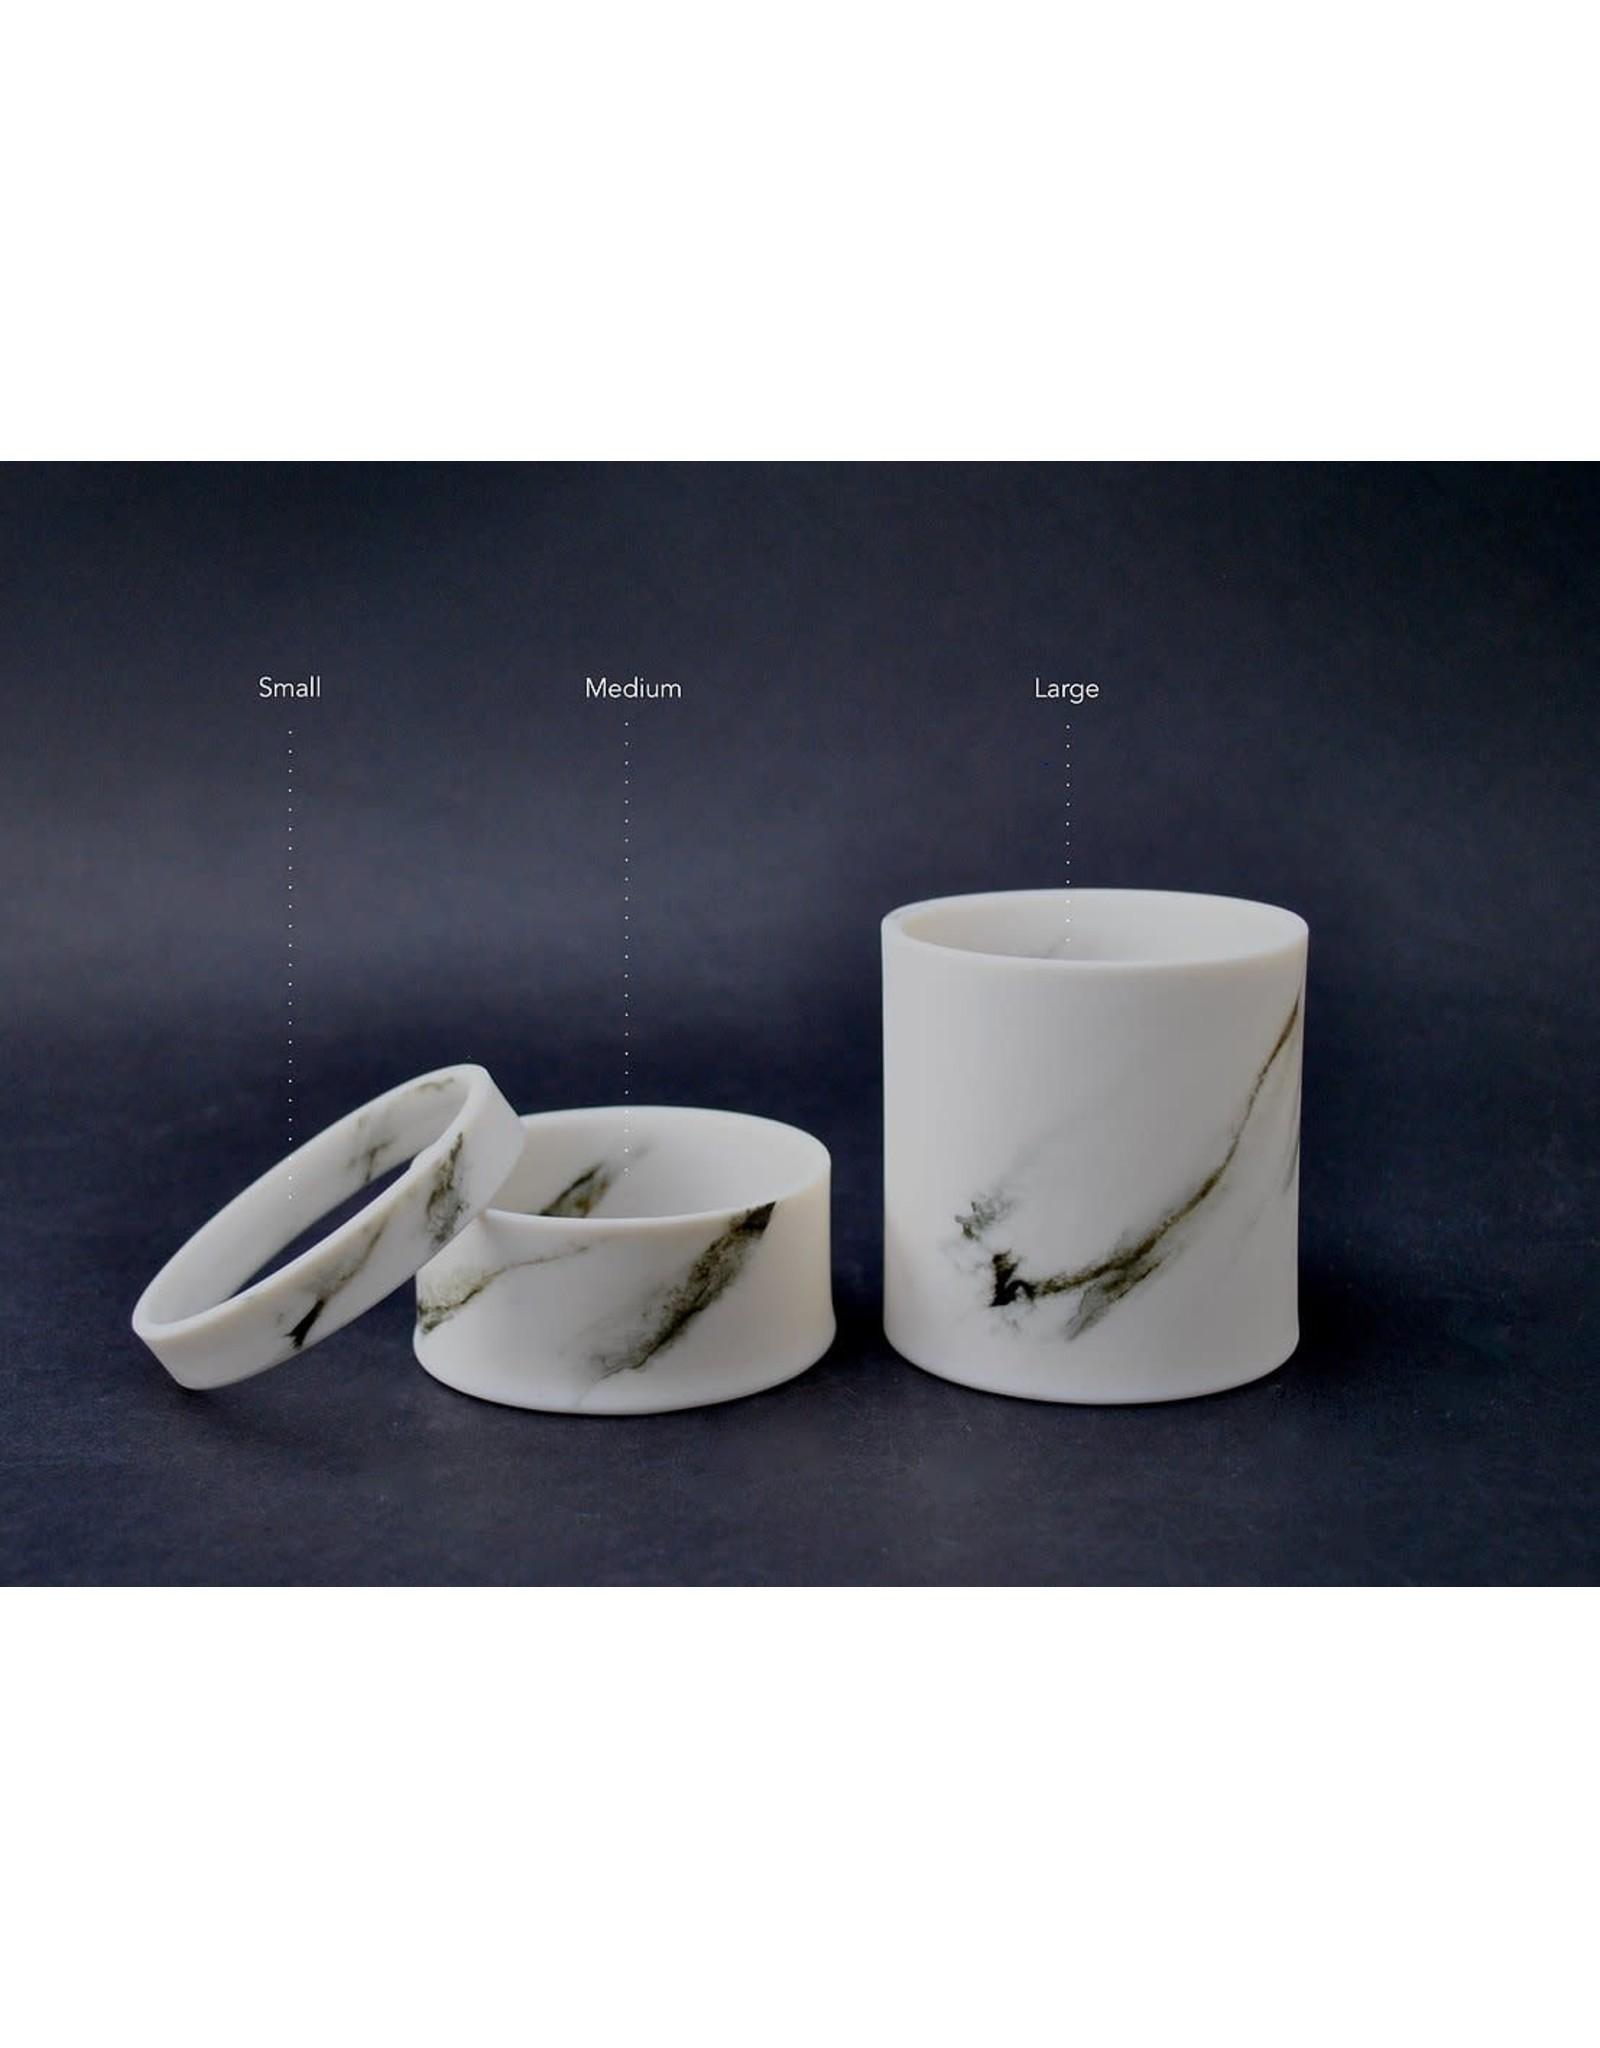 Porcelain Art Studio Armband 'Mix' Small